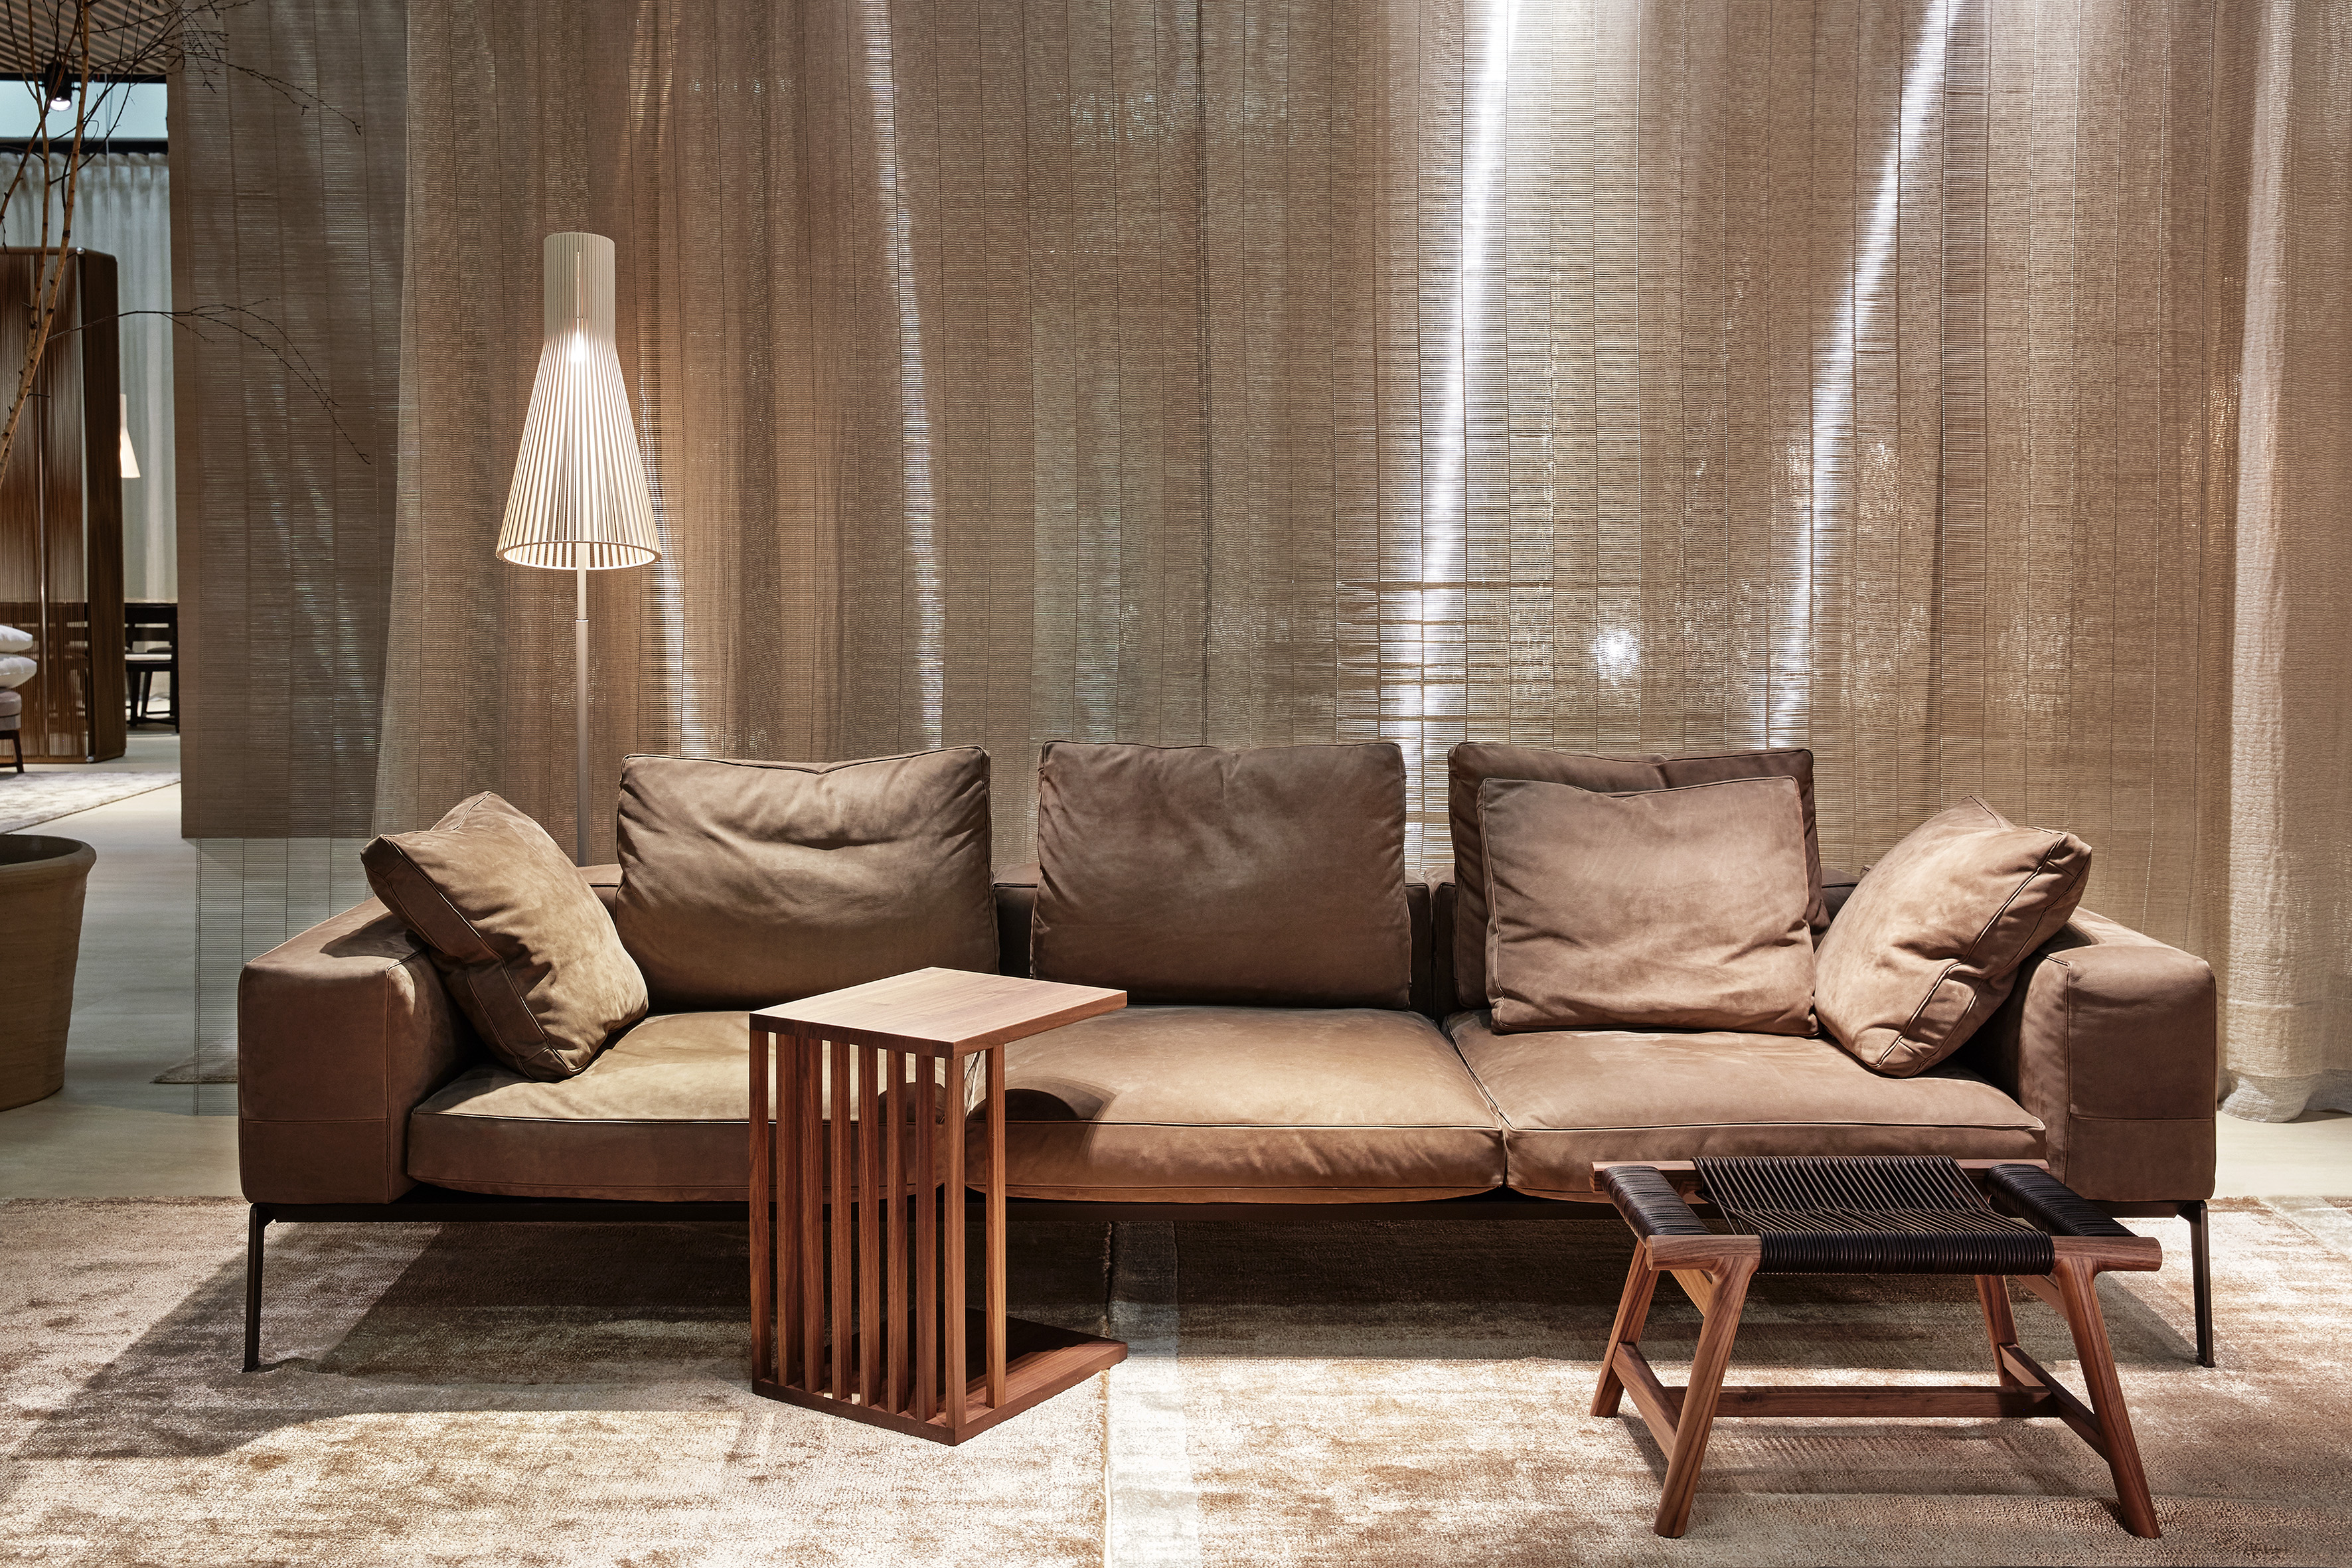 cassina sofa gebraucht stunning cassina gebraucht bei. Black Bedroom Furniture Sets. Home Design Ideas